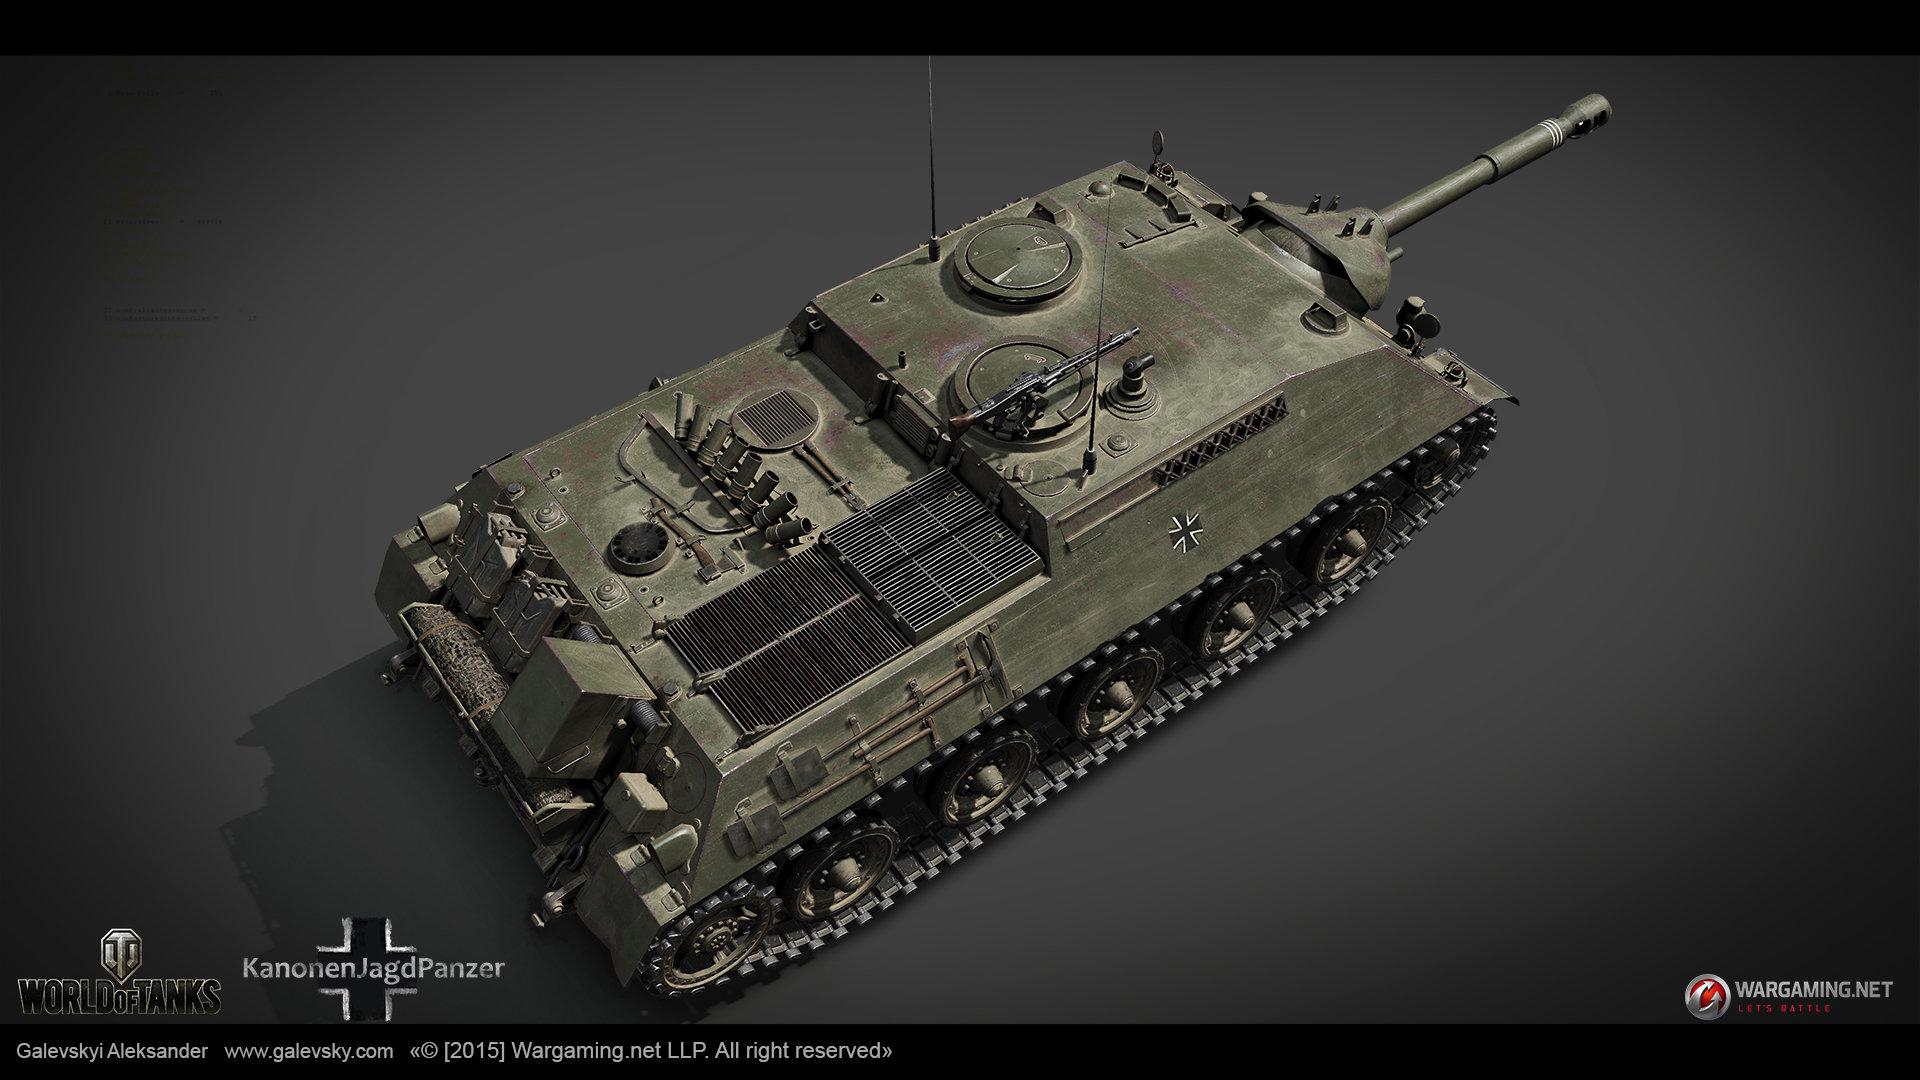 KanonenJagdPanzer. German Tank Destroyer (TIER VIII)